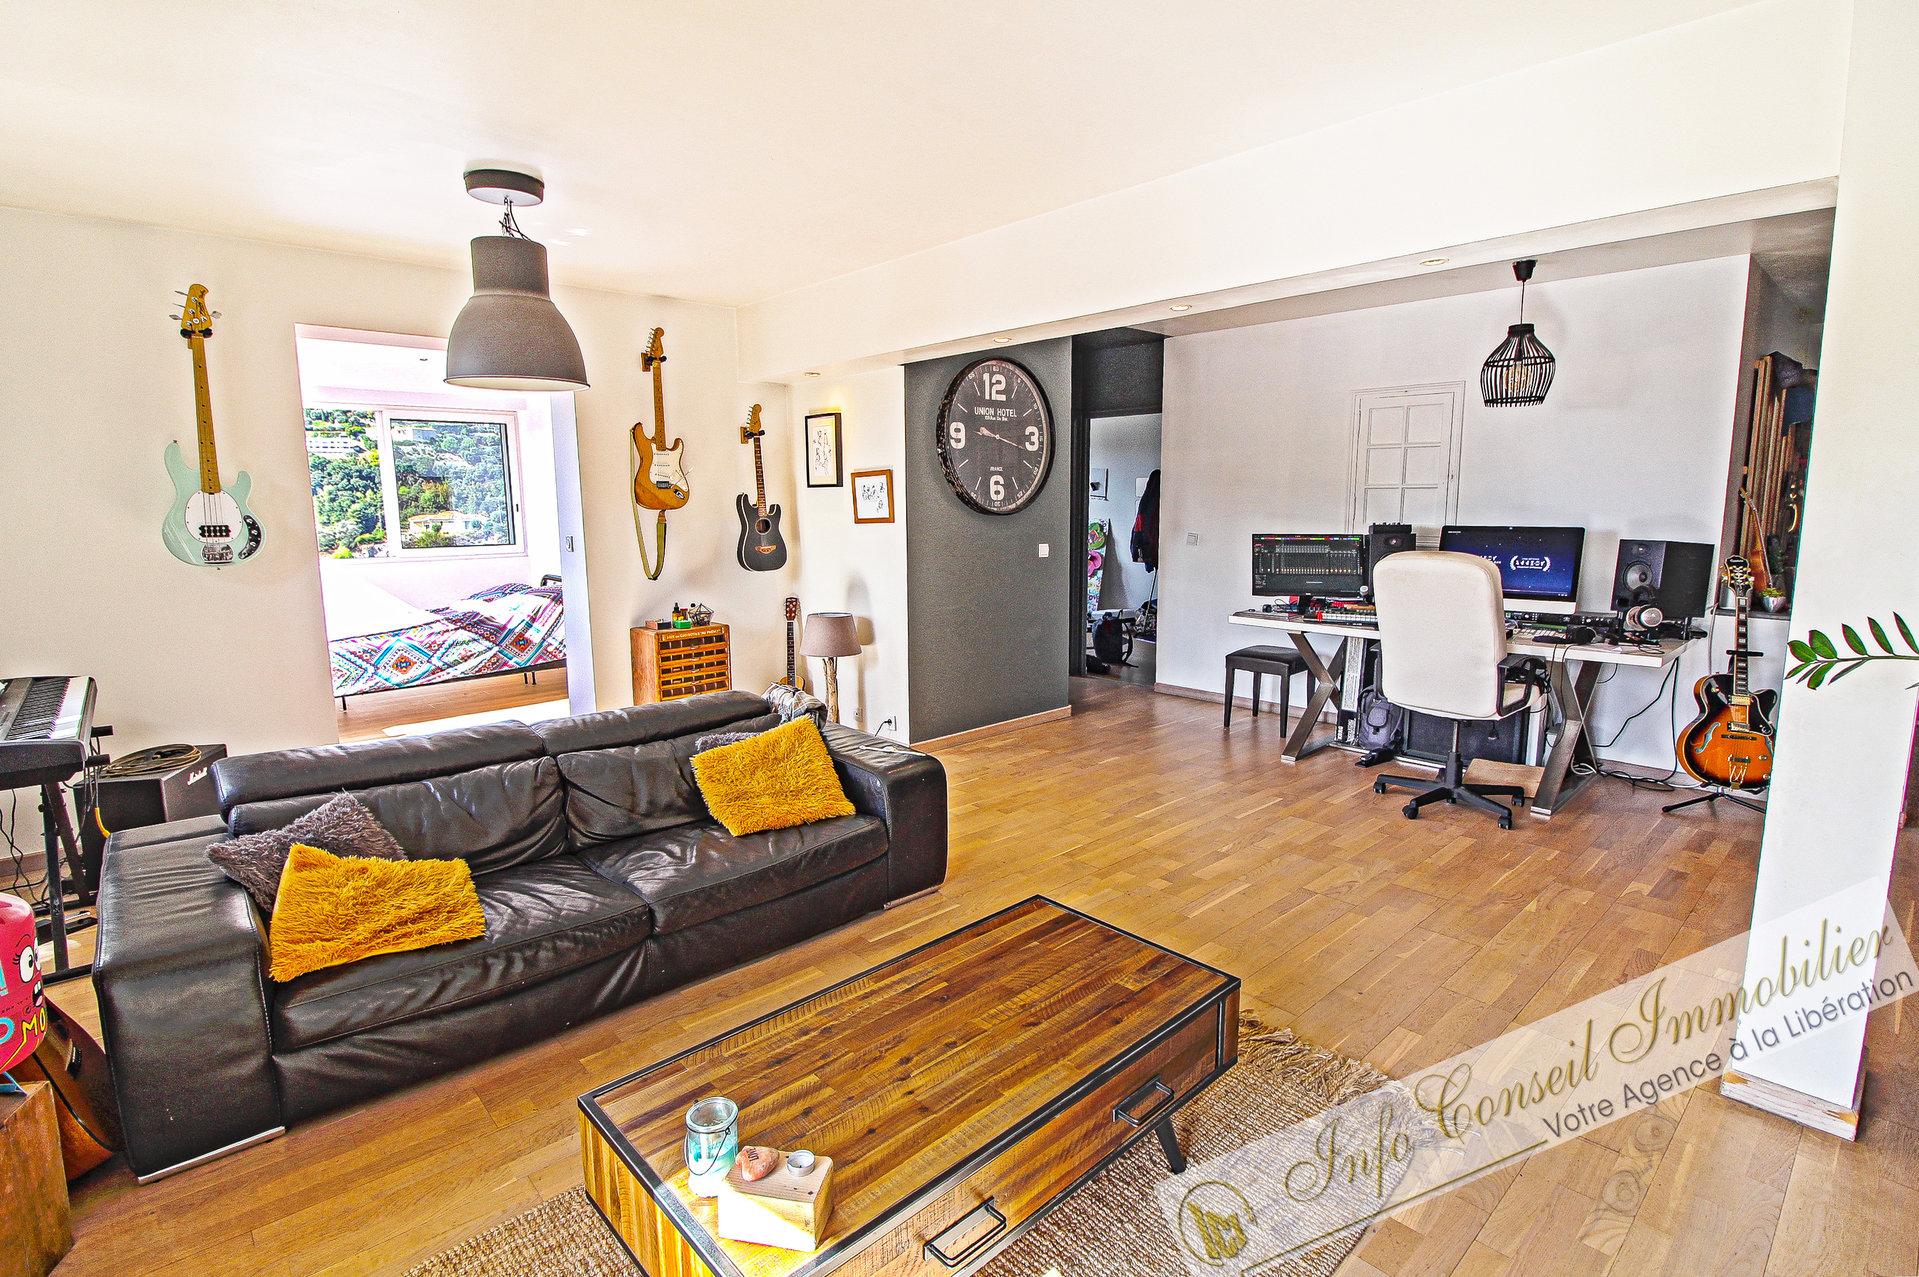 COLLINE DE PESSICART - 4P 103 m² - Jardin 56m² - 475.000 €